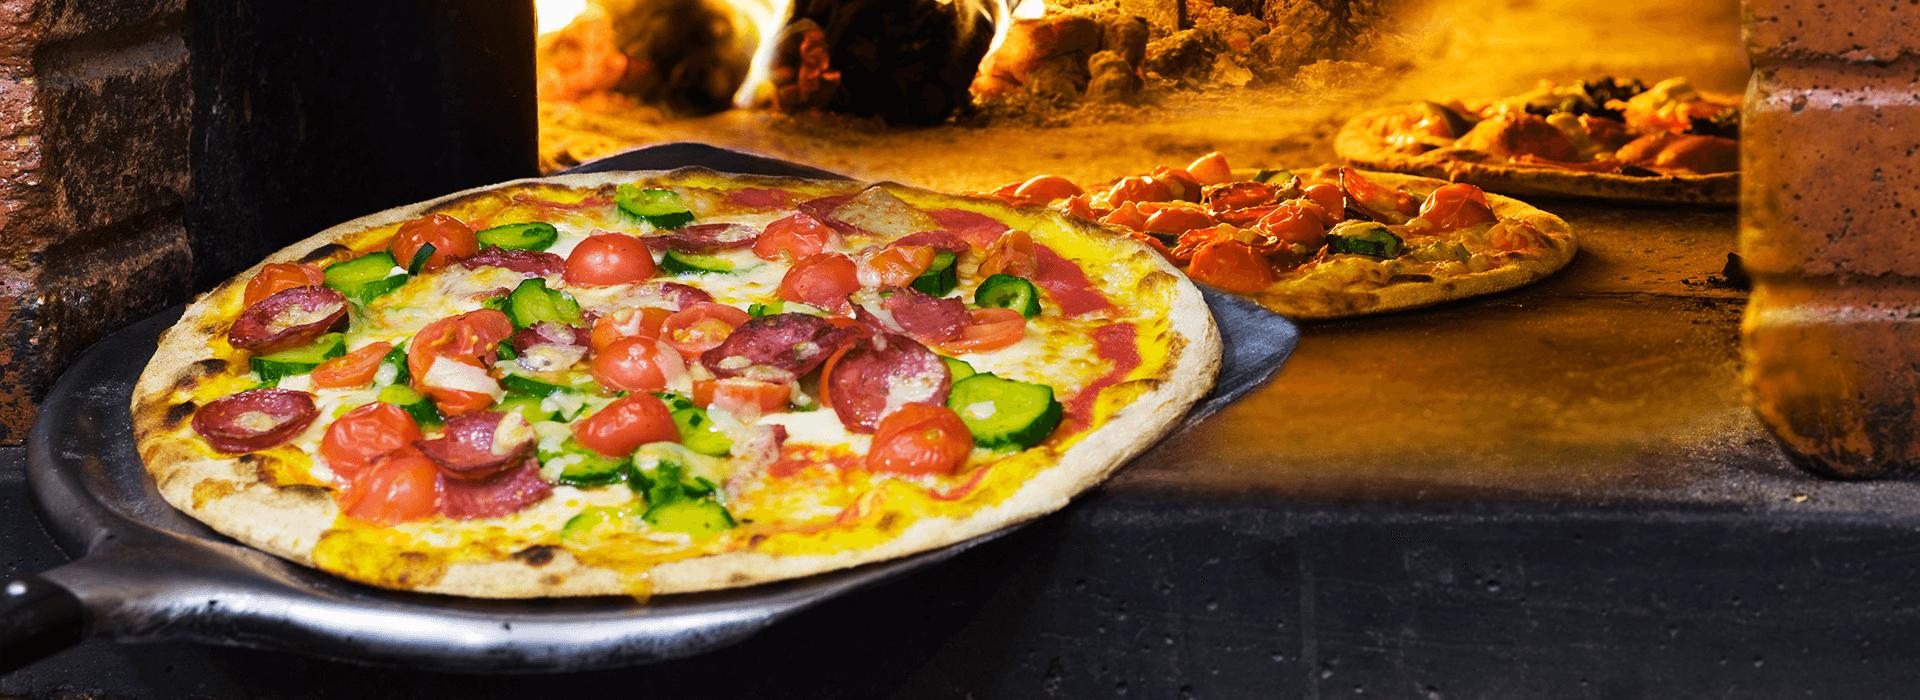 slider11-pizzeria-avantipizza-pizzeria-fast-food-Ixelles